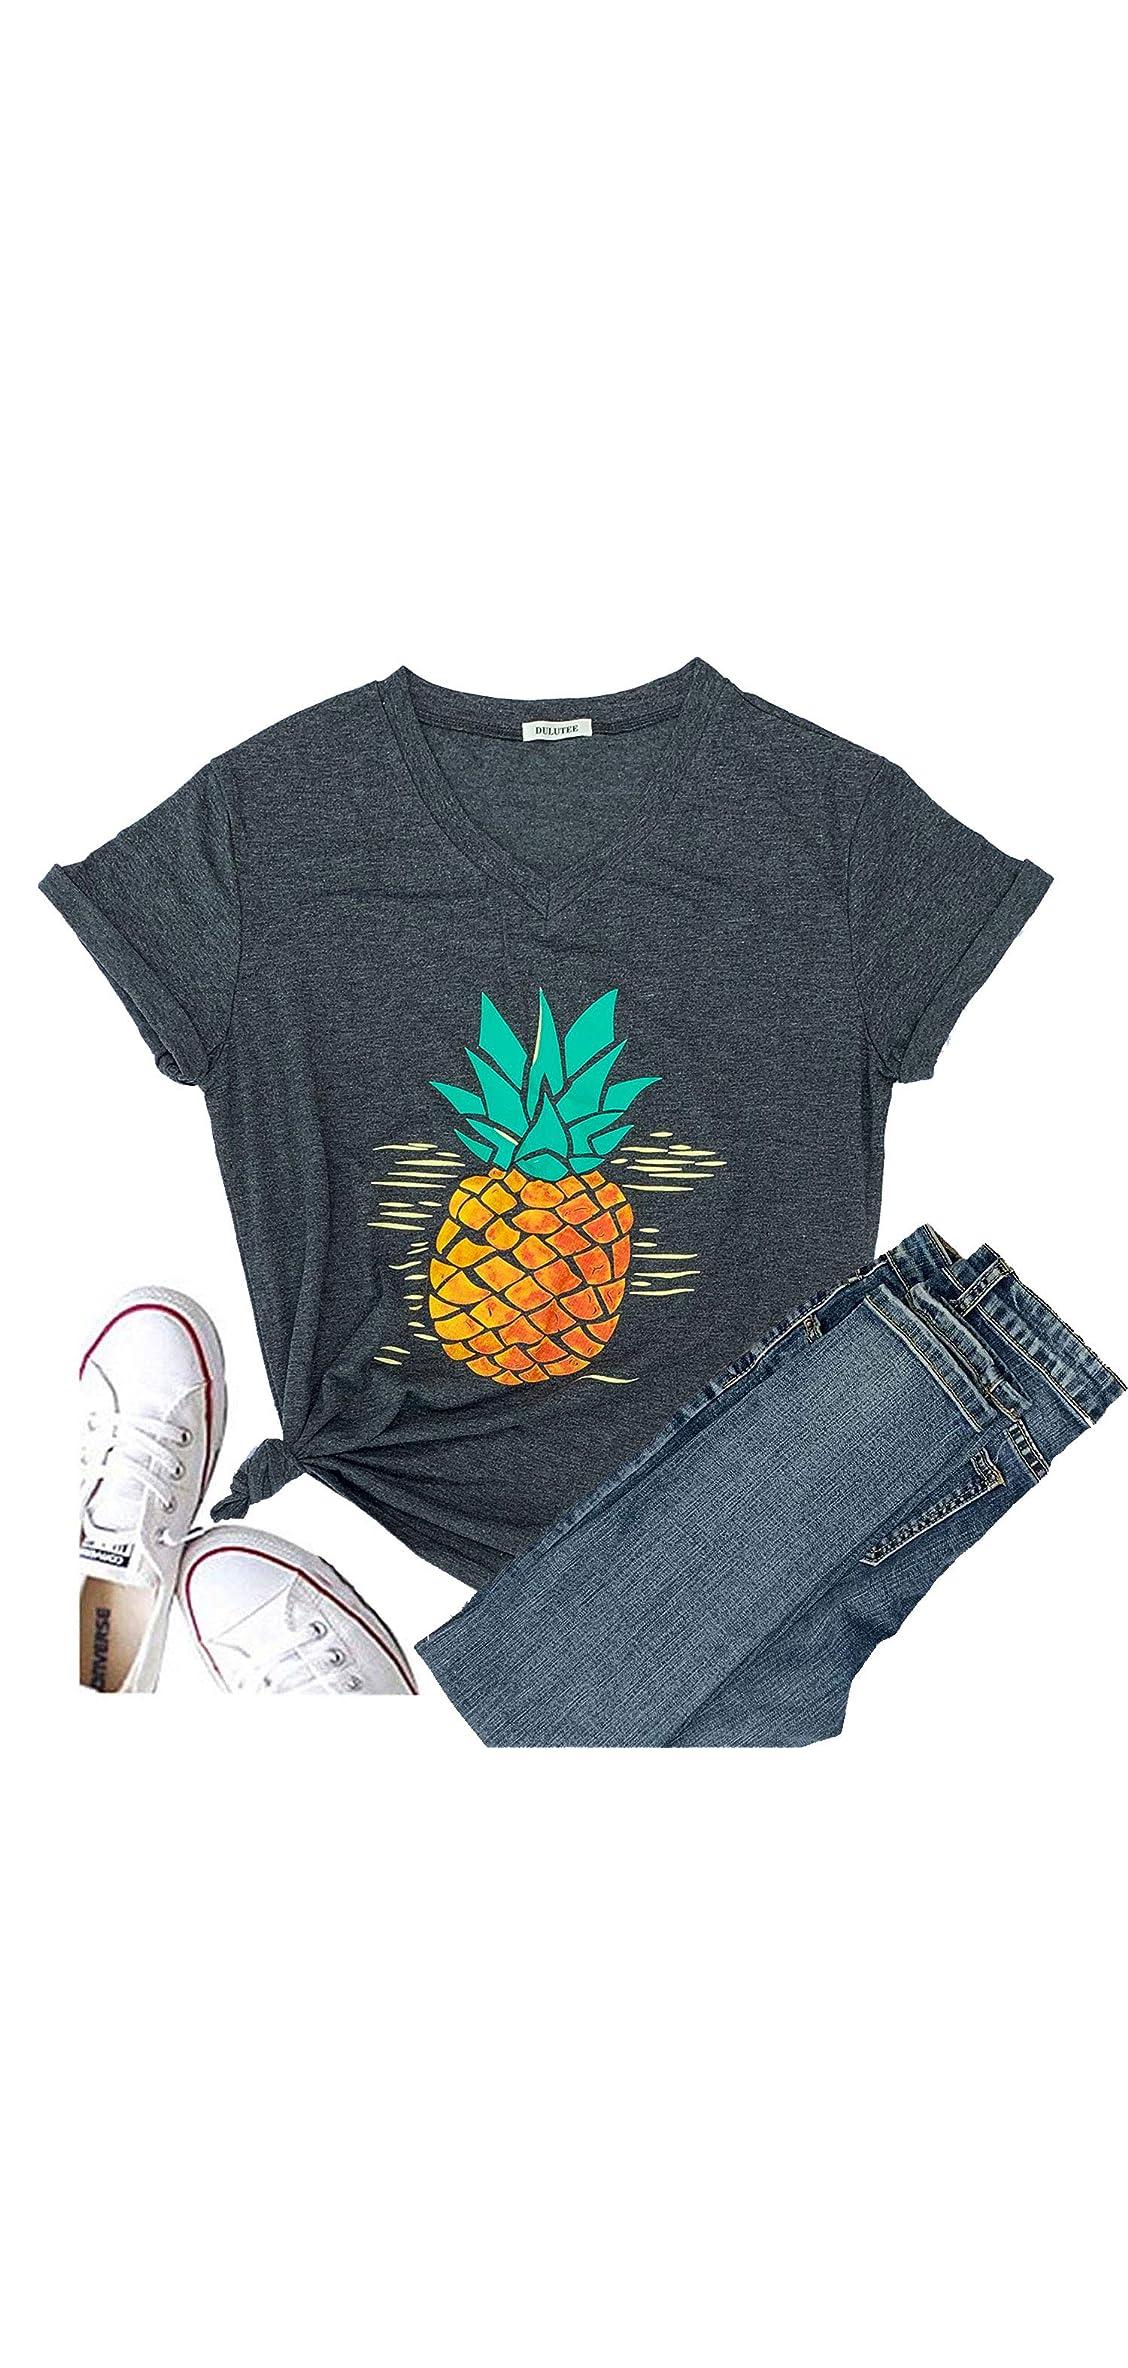 Pineapple Women's Funny Christmas Cute T Shirt Lover